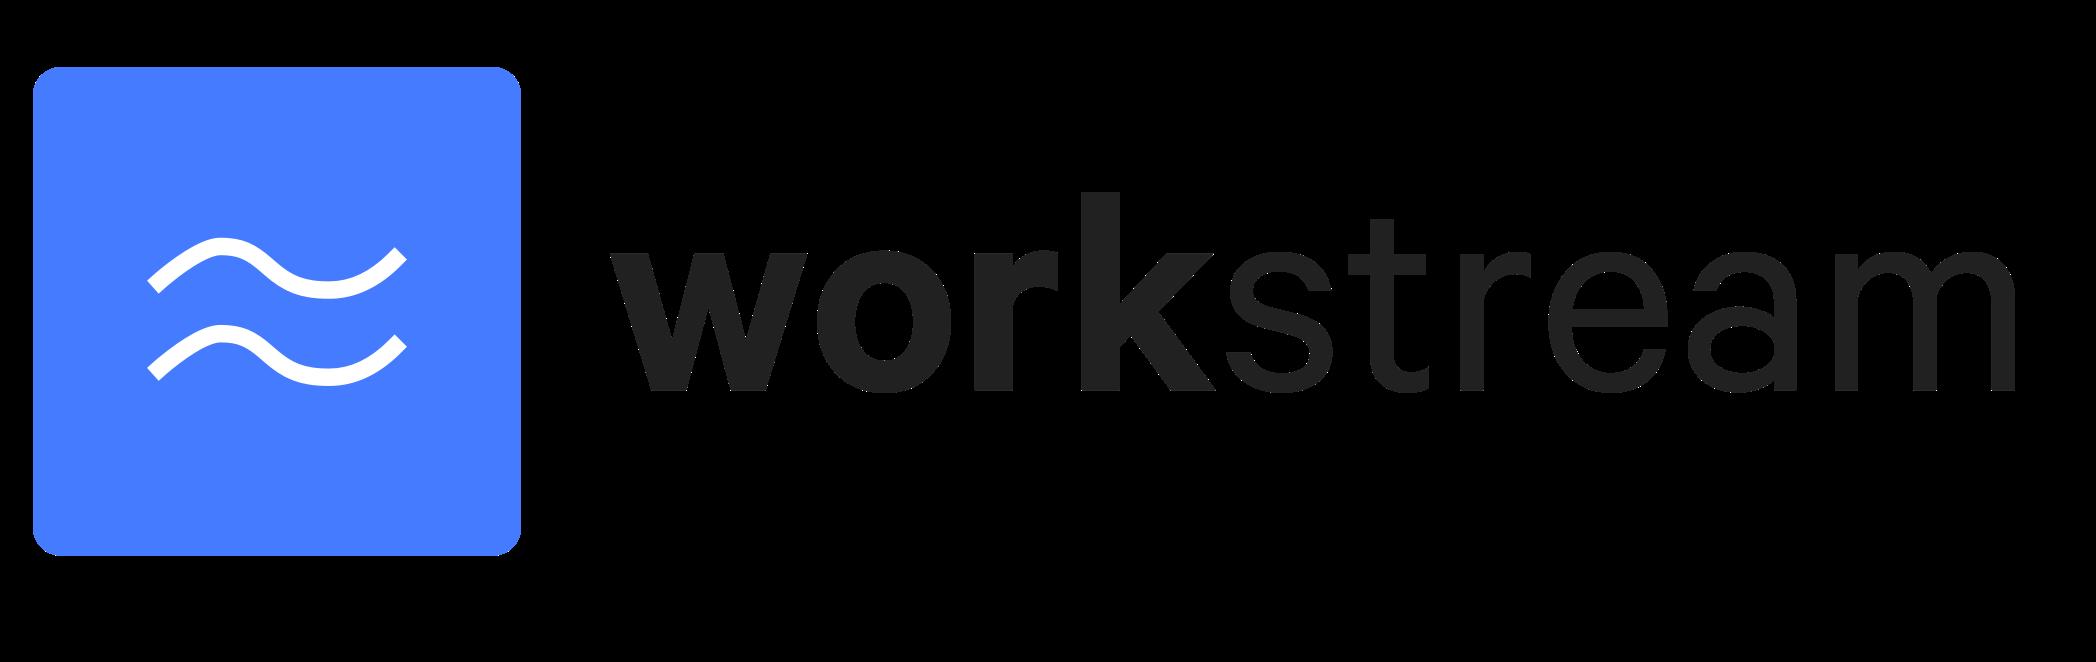 Workstream company logo